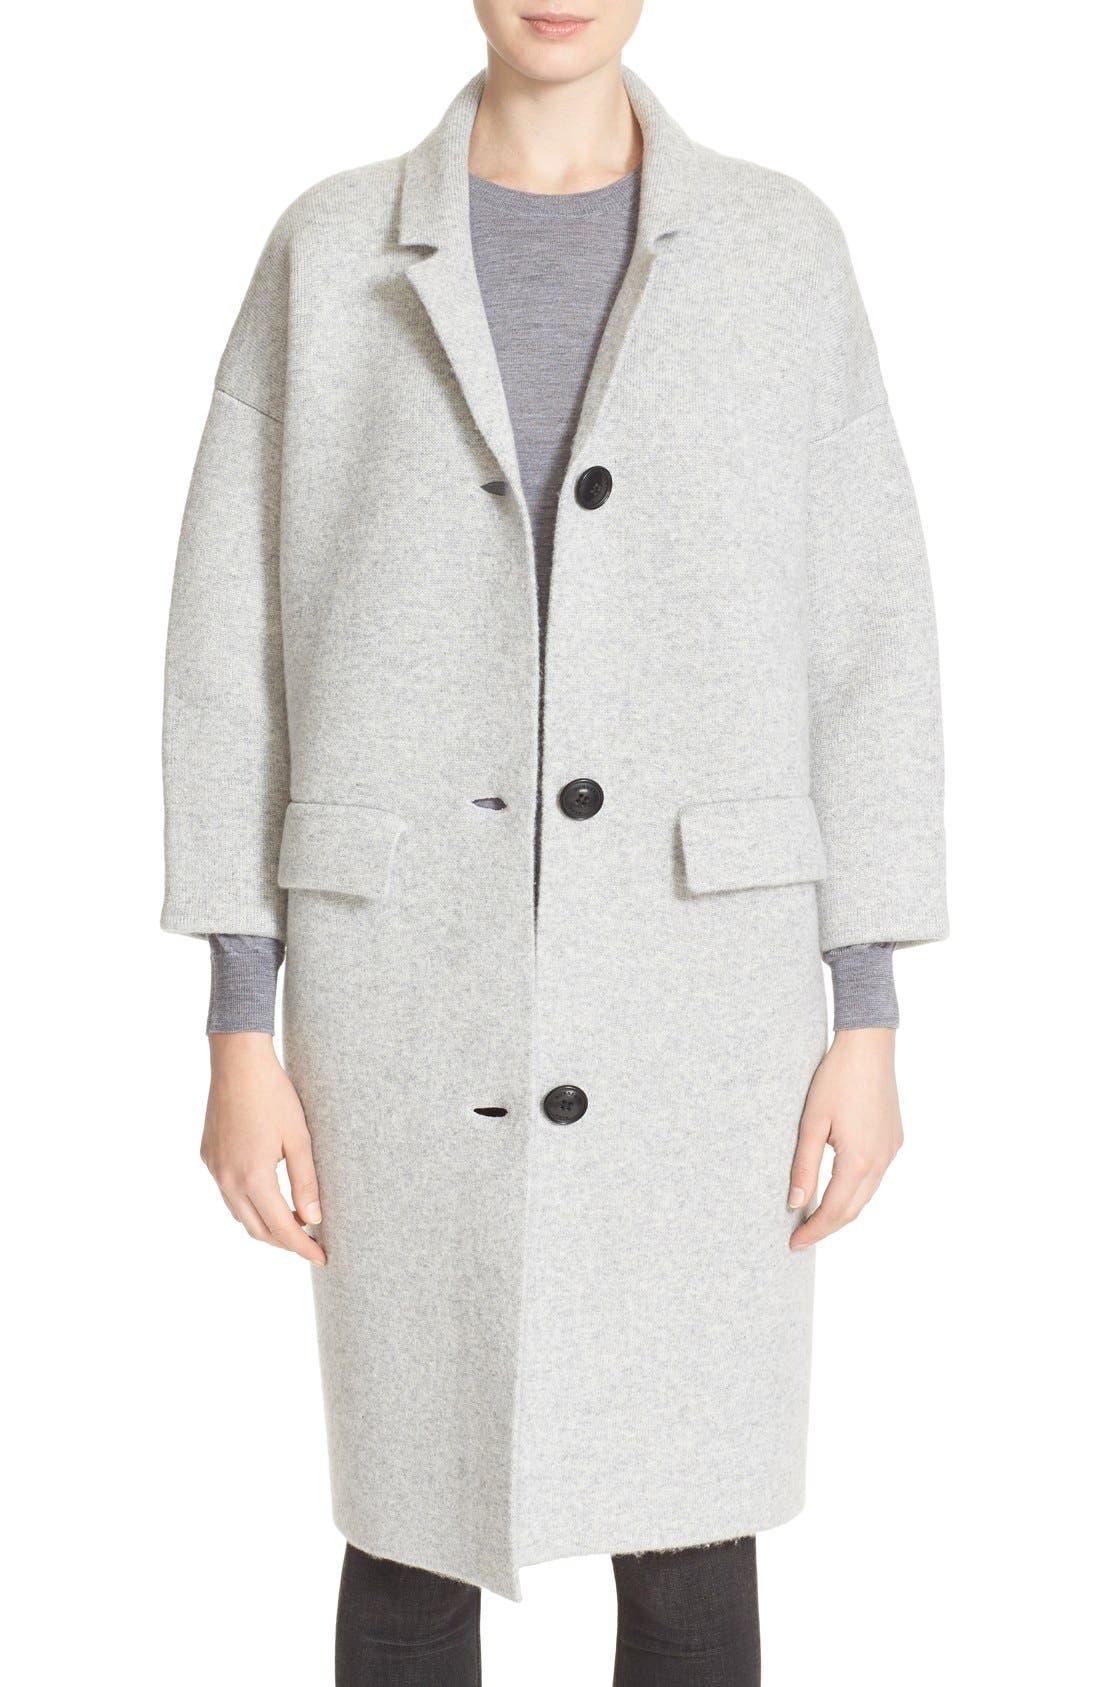 Main Image - Burberry Brit Wool & Cashmere Knit Long Coat